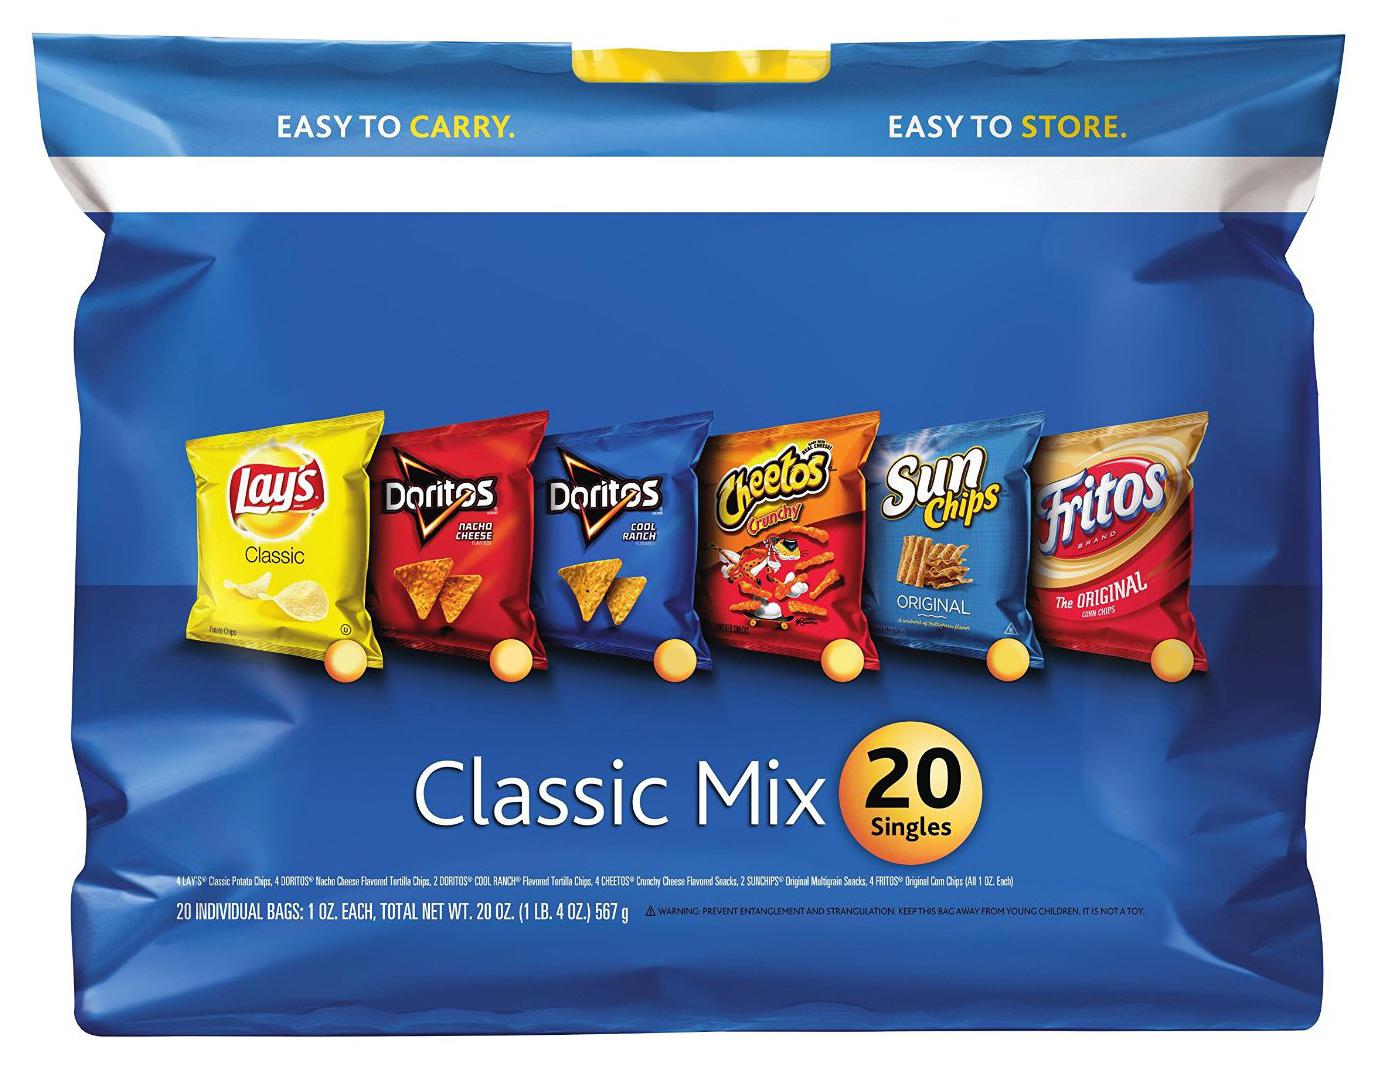 Classic Mix 20 Bags